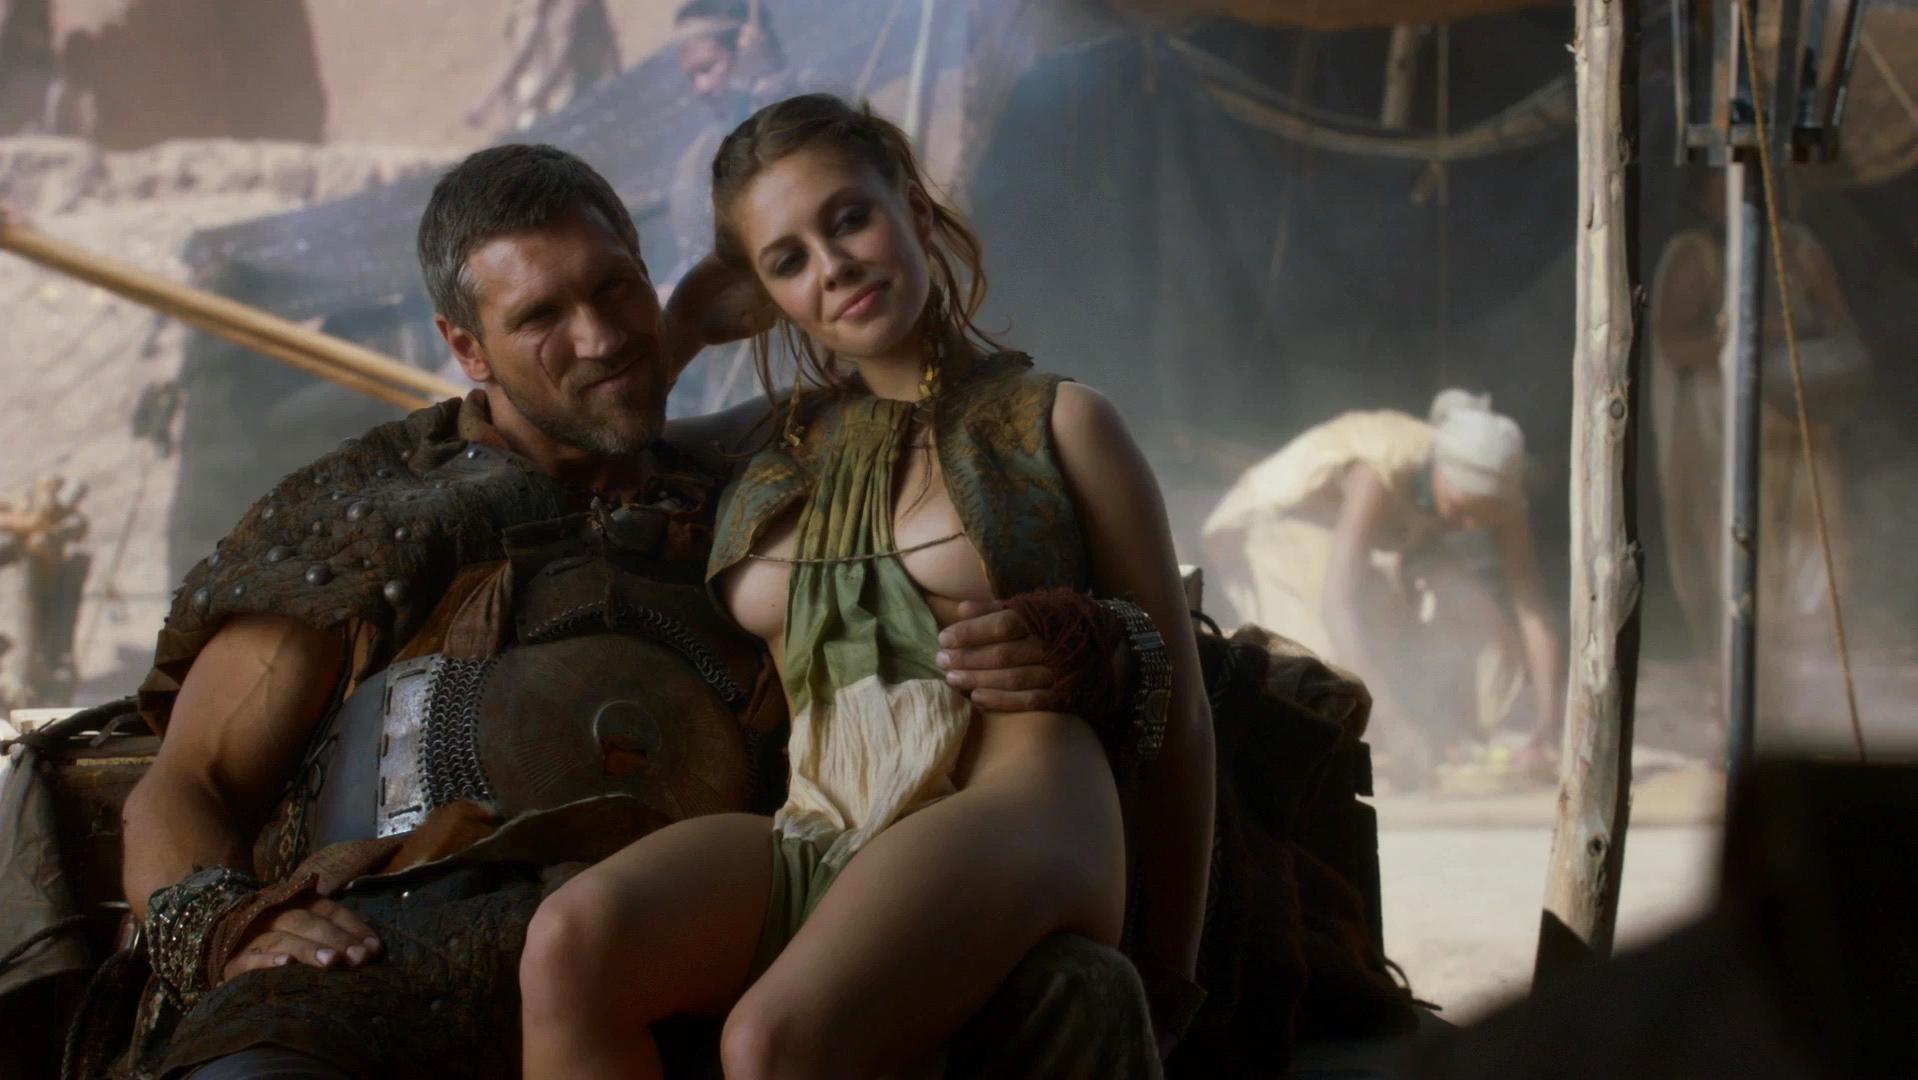 Talitha Luke-Eardley nude - Game of Thrones s03e08 (2013)